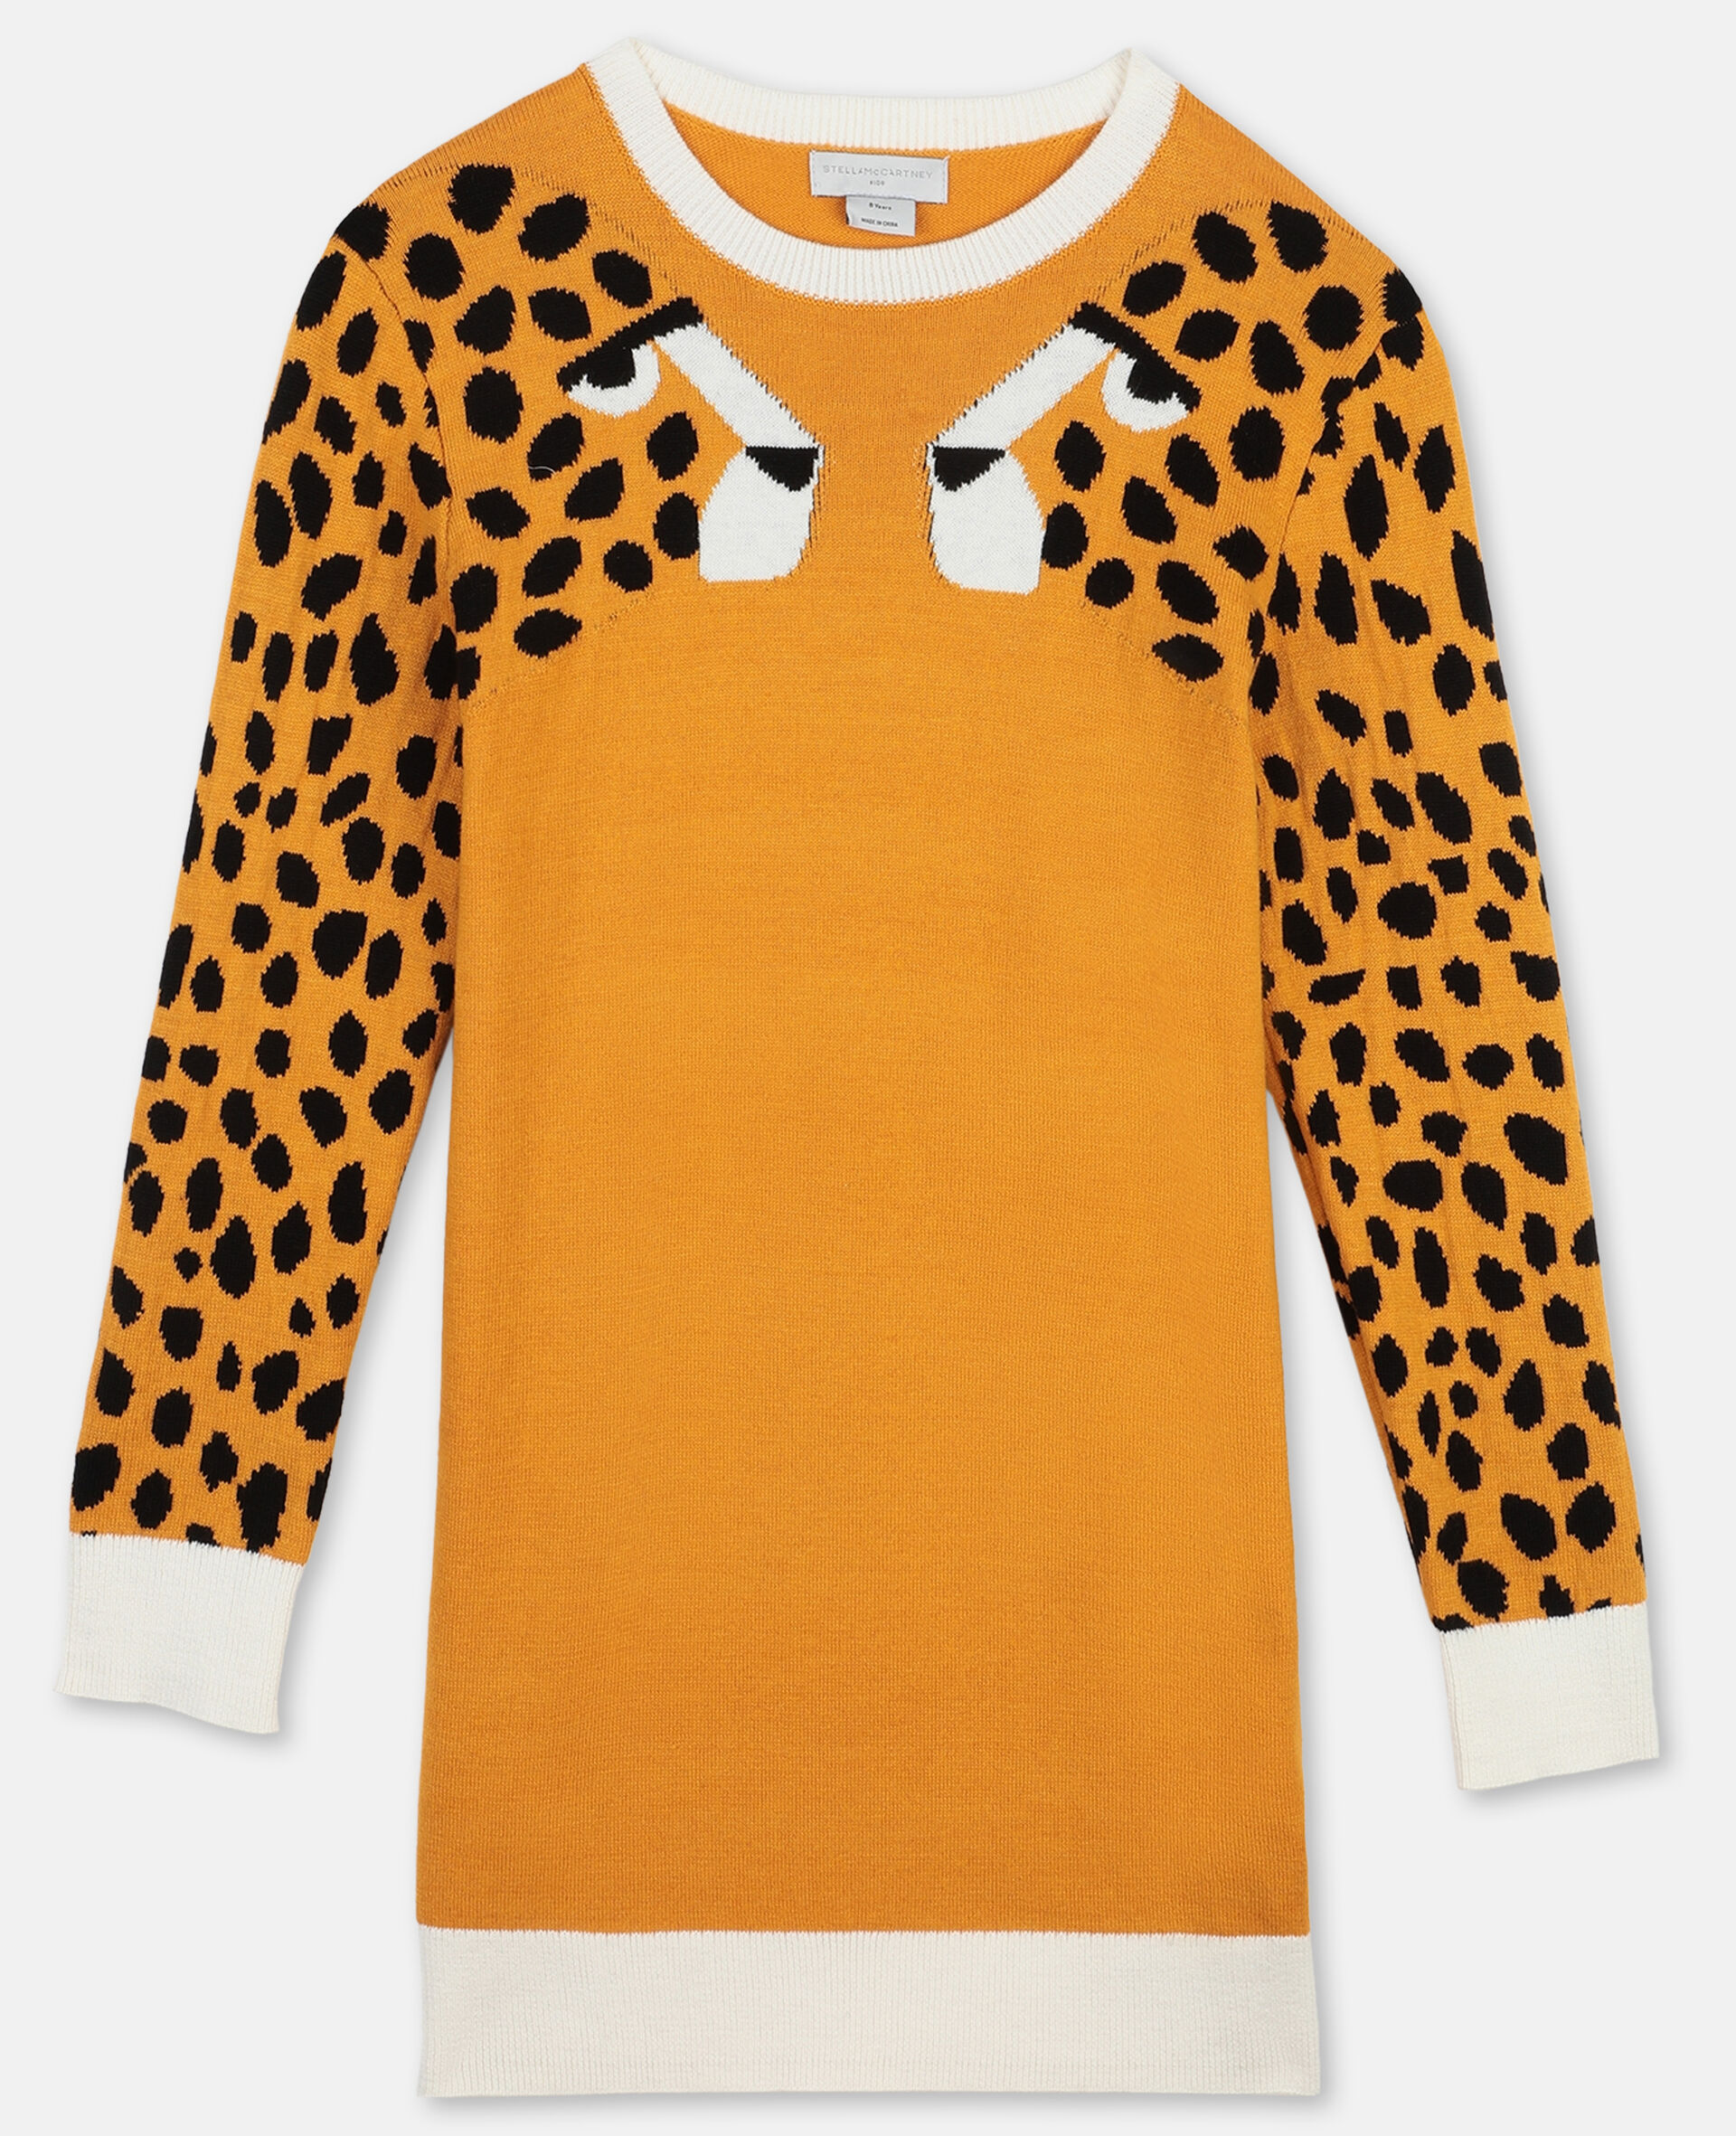 Cheetah嵌花针织连衣裙-橙色-large image number 0